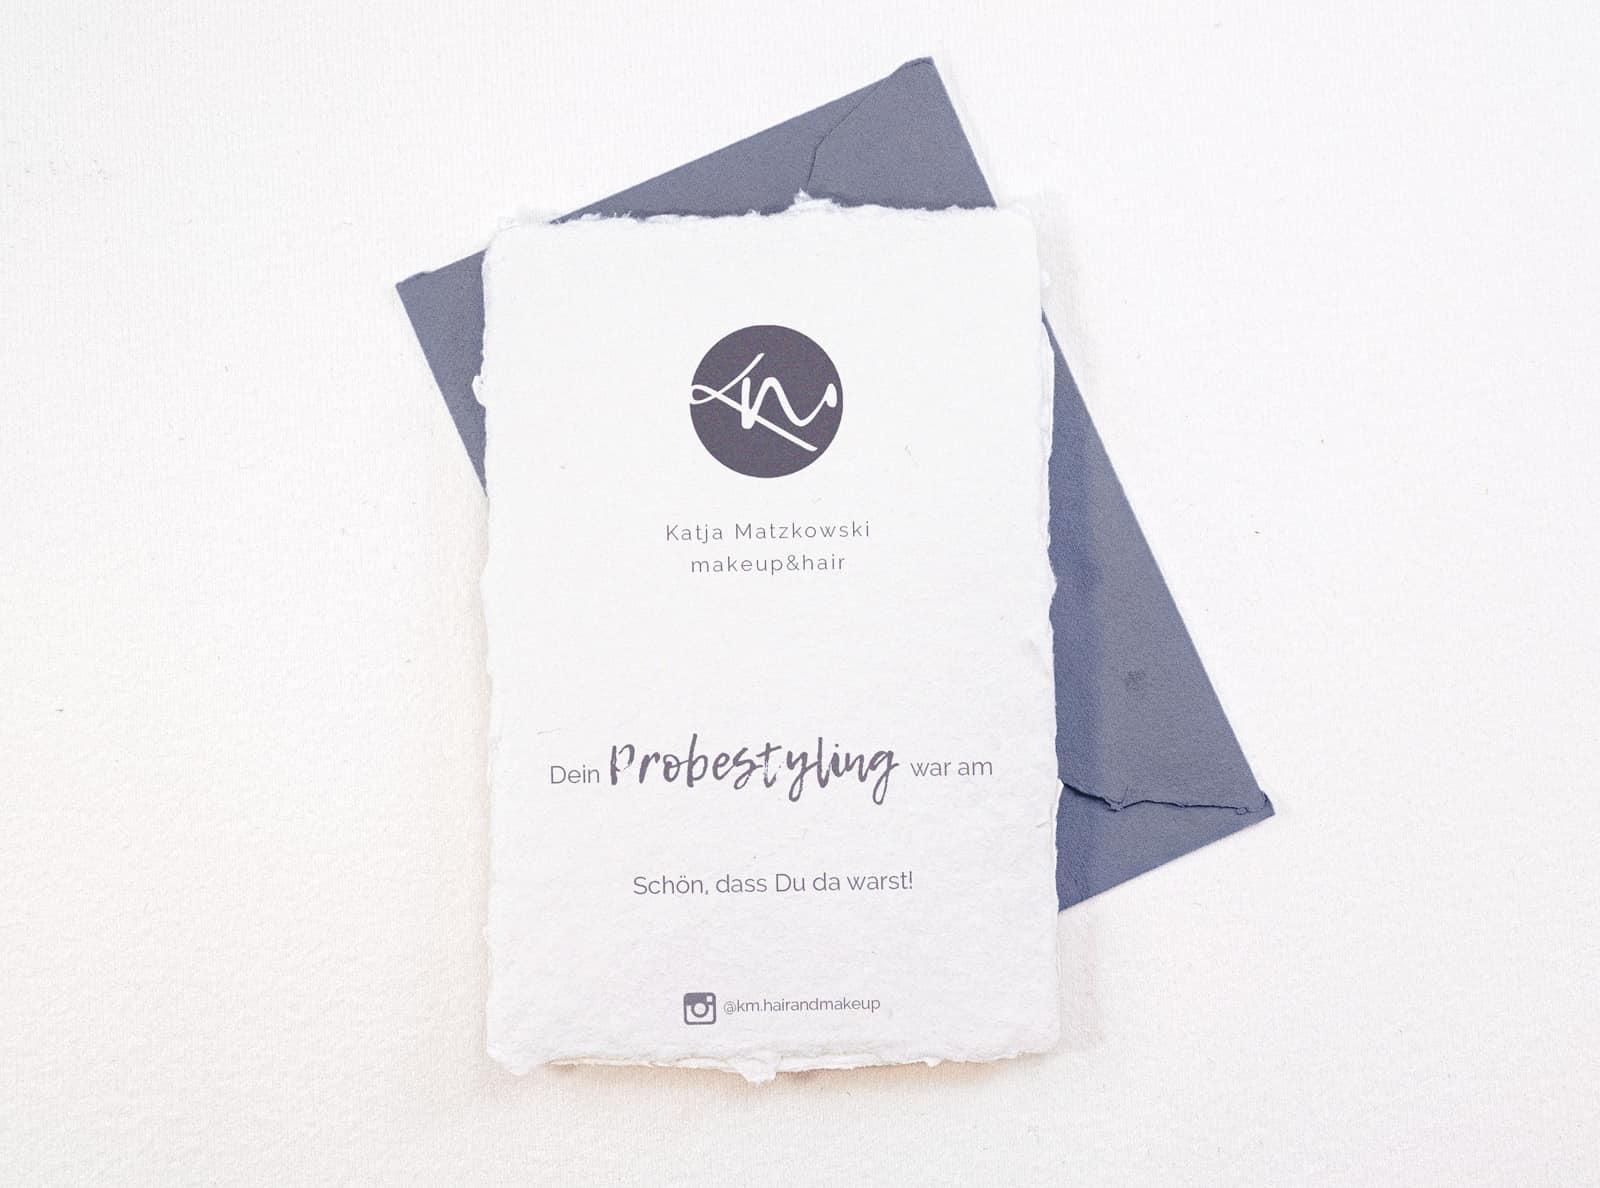 Katja-Matzkowski_Kama-Art_Wedding-Card_01